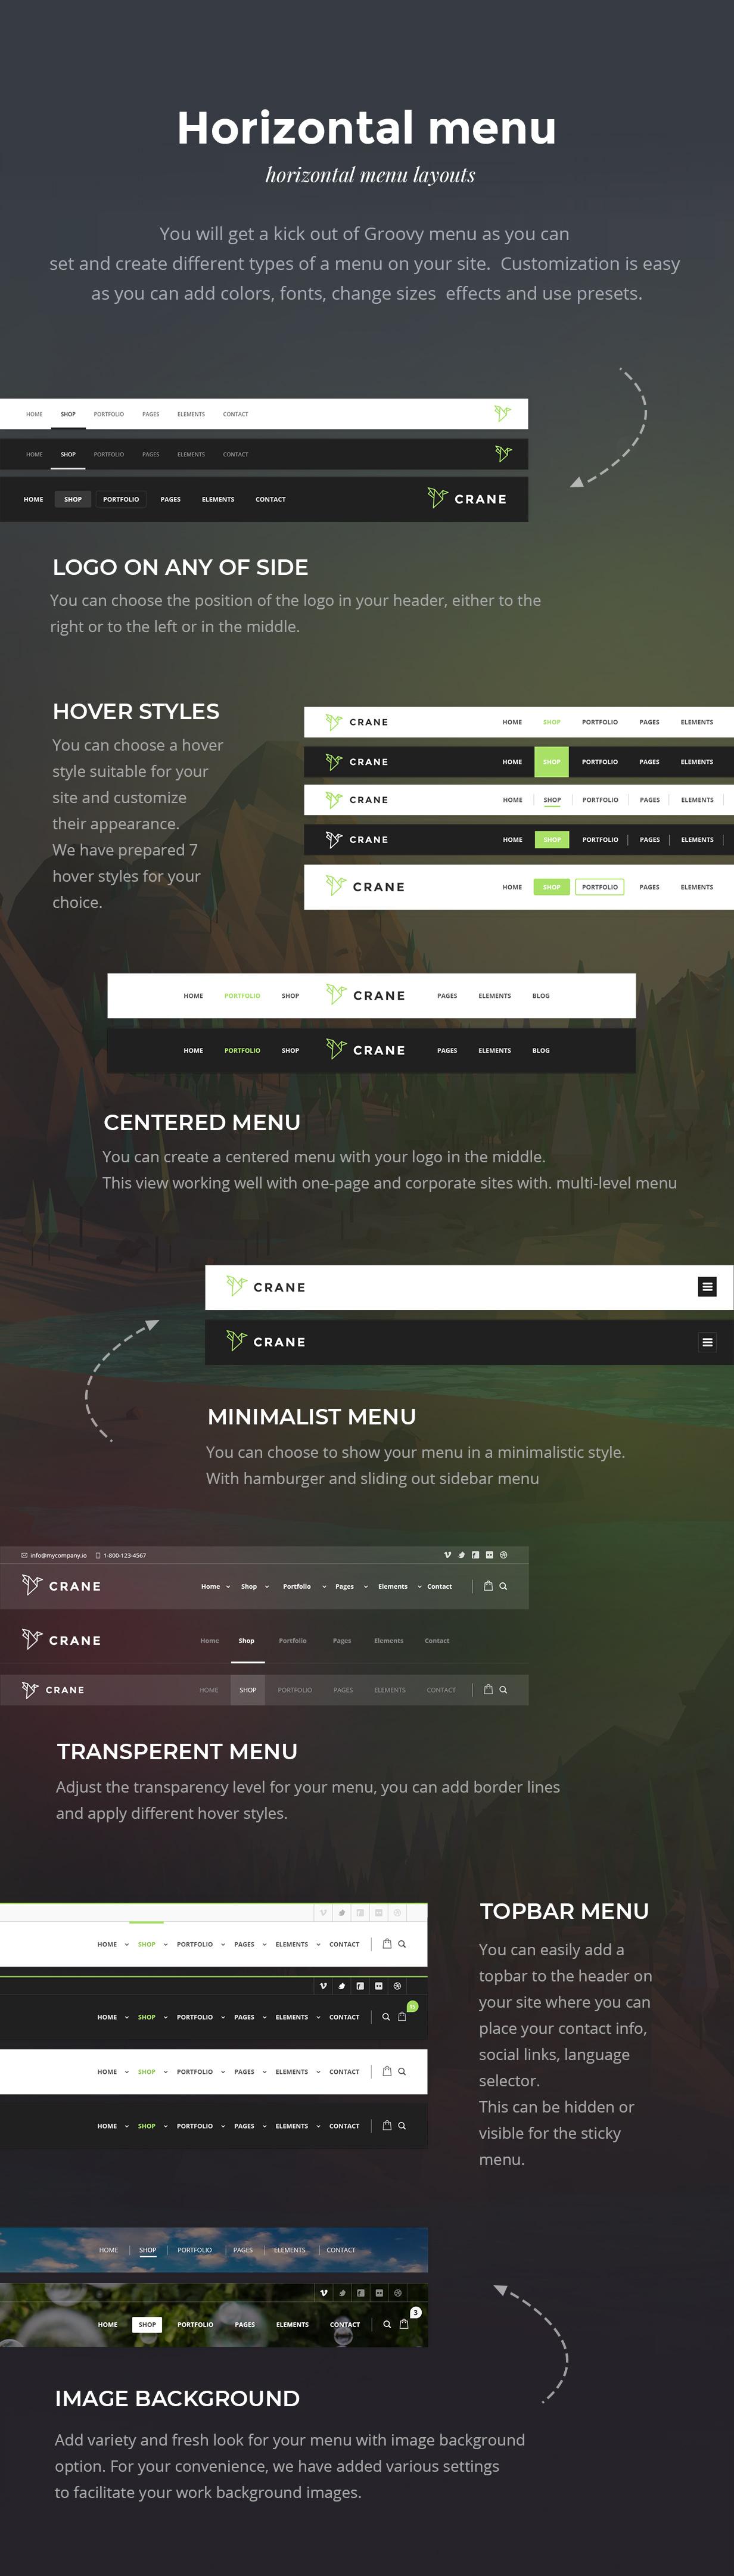 Crane - Easy to create Onepage, Corporate Business Website and Creative Portfolio